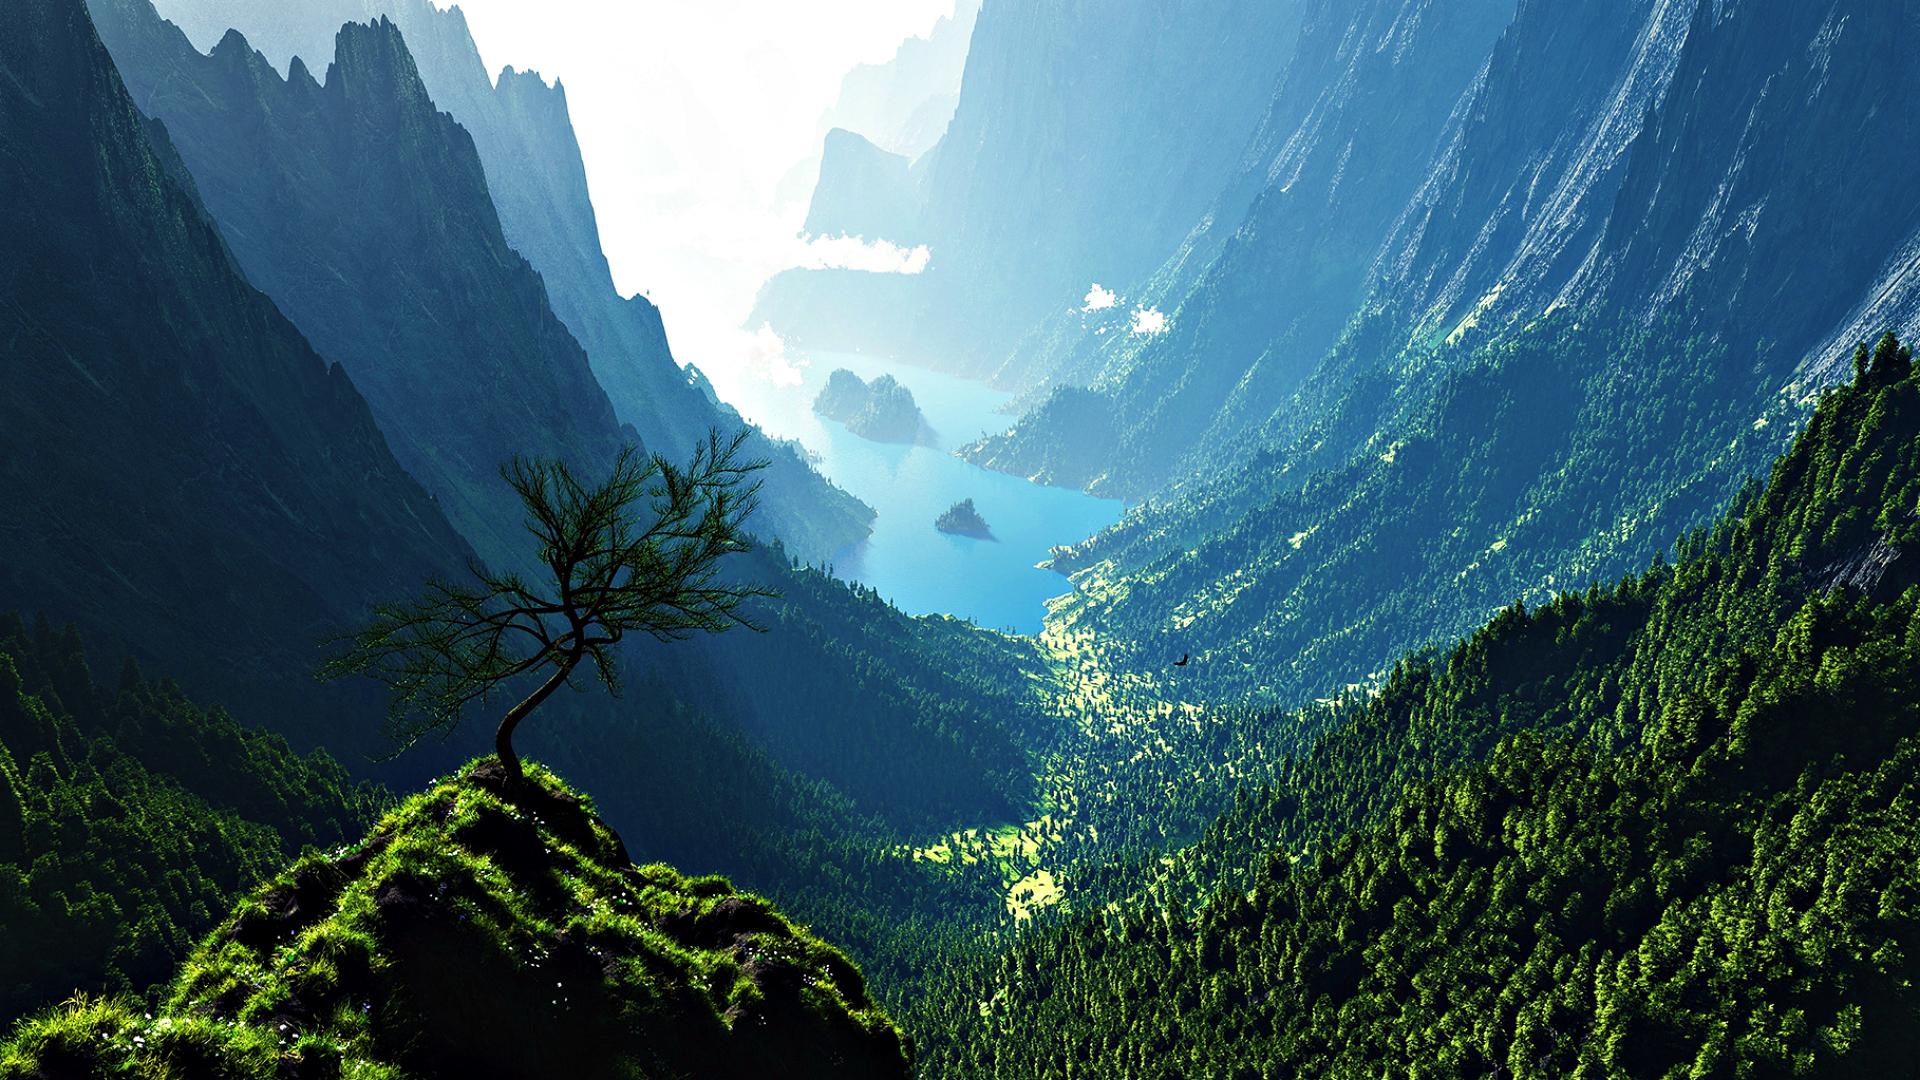 mountain valley hd wallpaper 1920x1080 27277